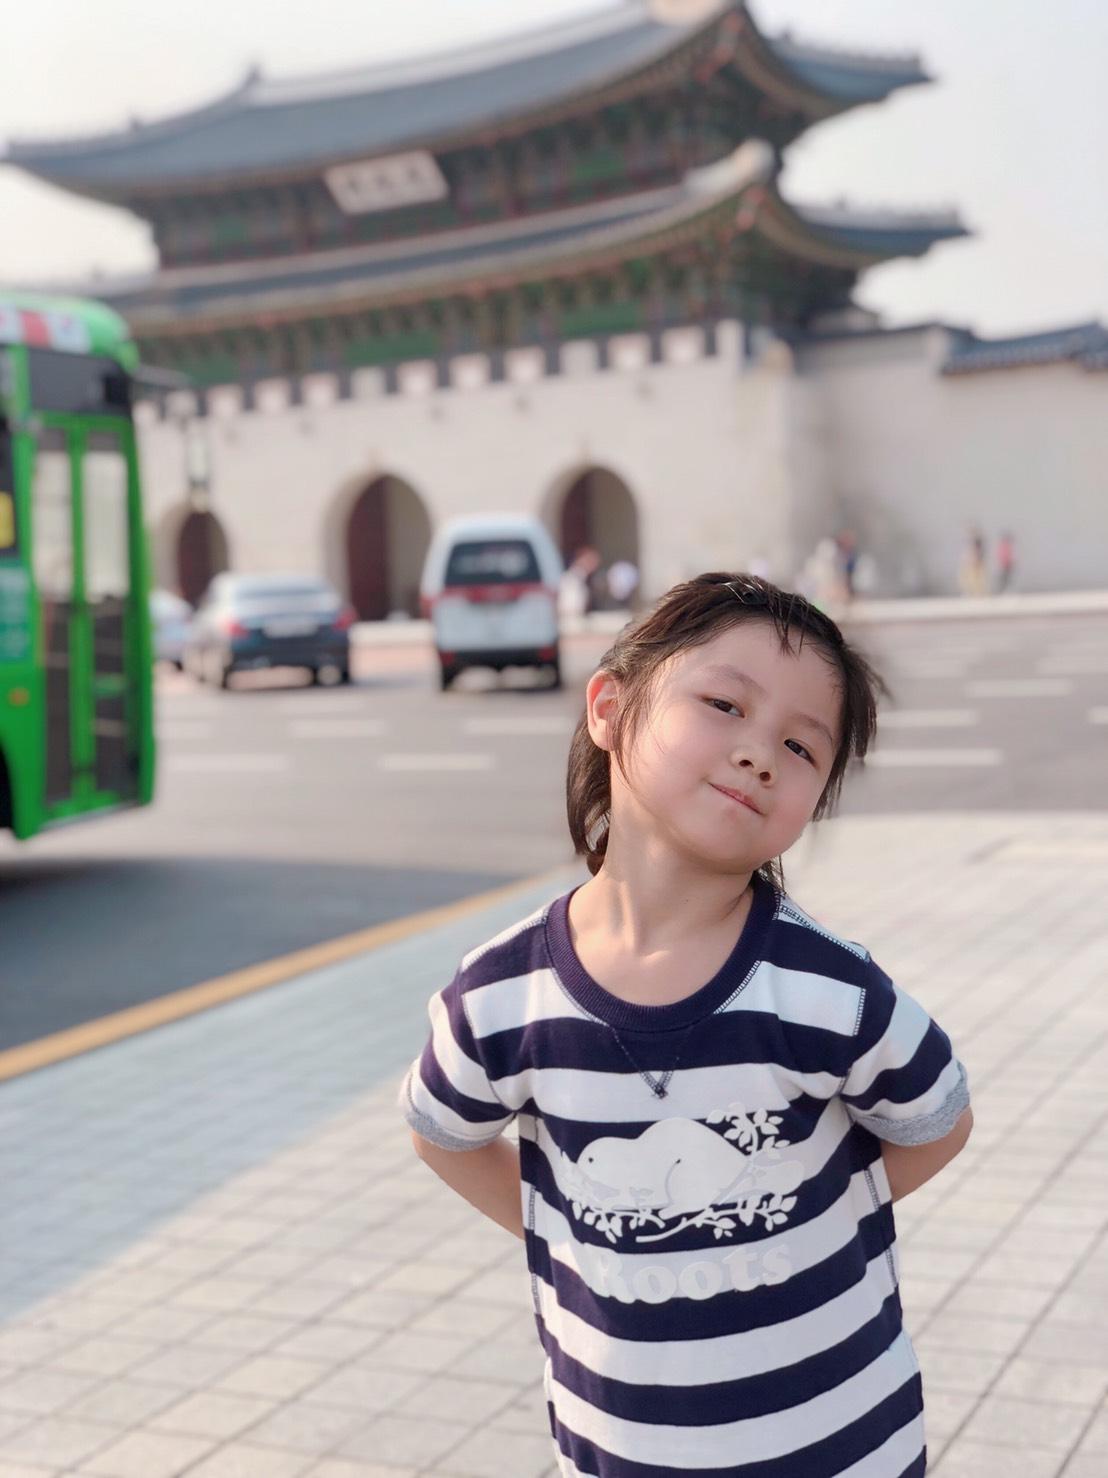 ▲Kim認為,只要全家人一起,不管去哪裡旅遊都無所謂。